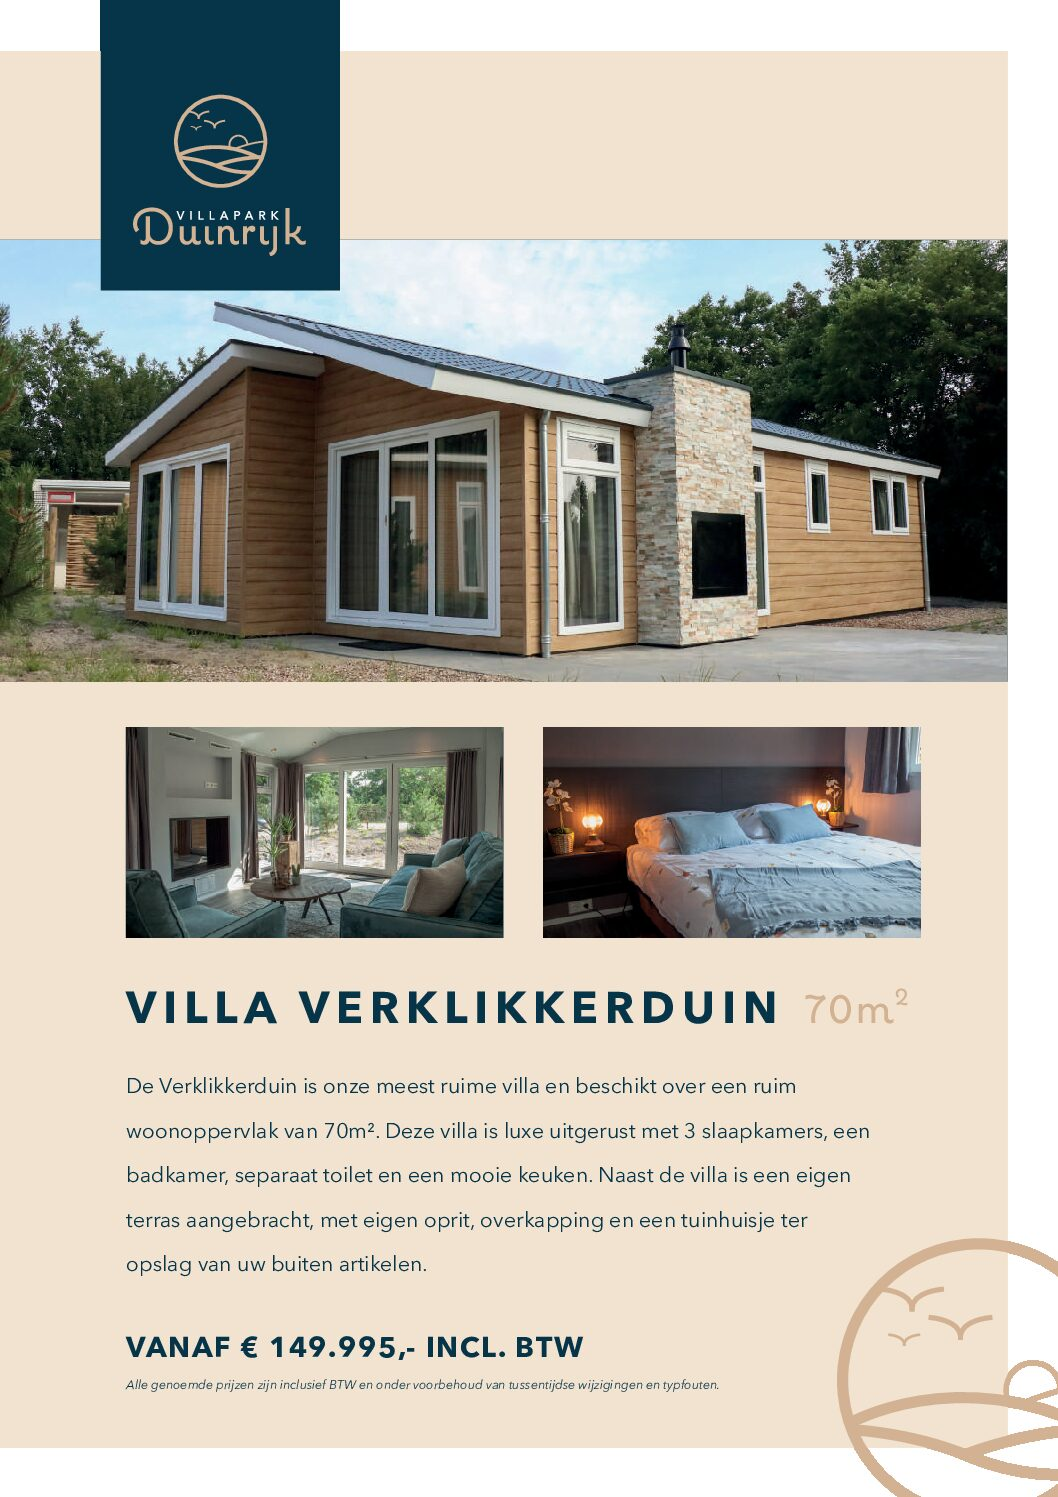 Villapark Duinrijk Verklikkerduin